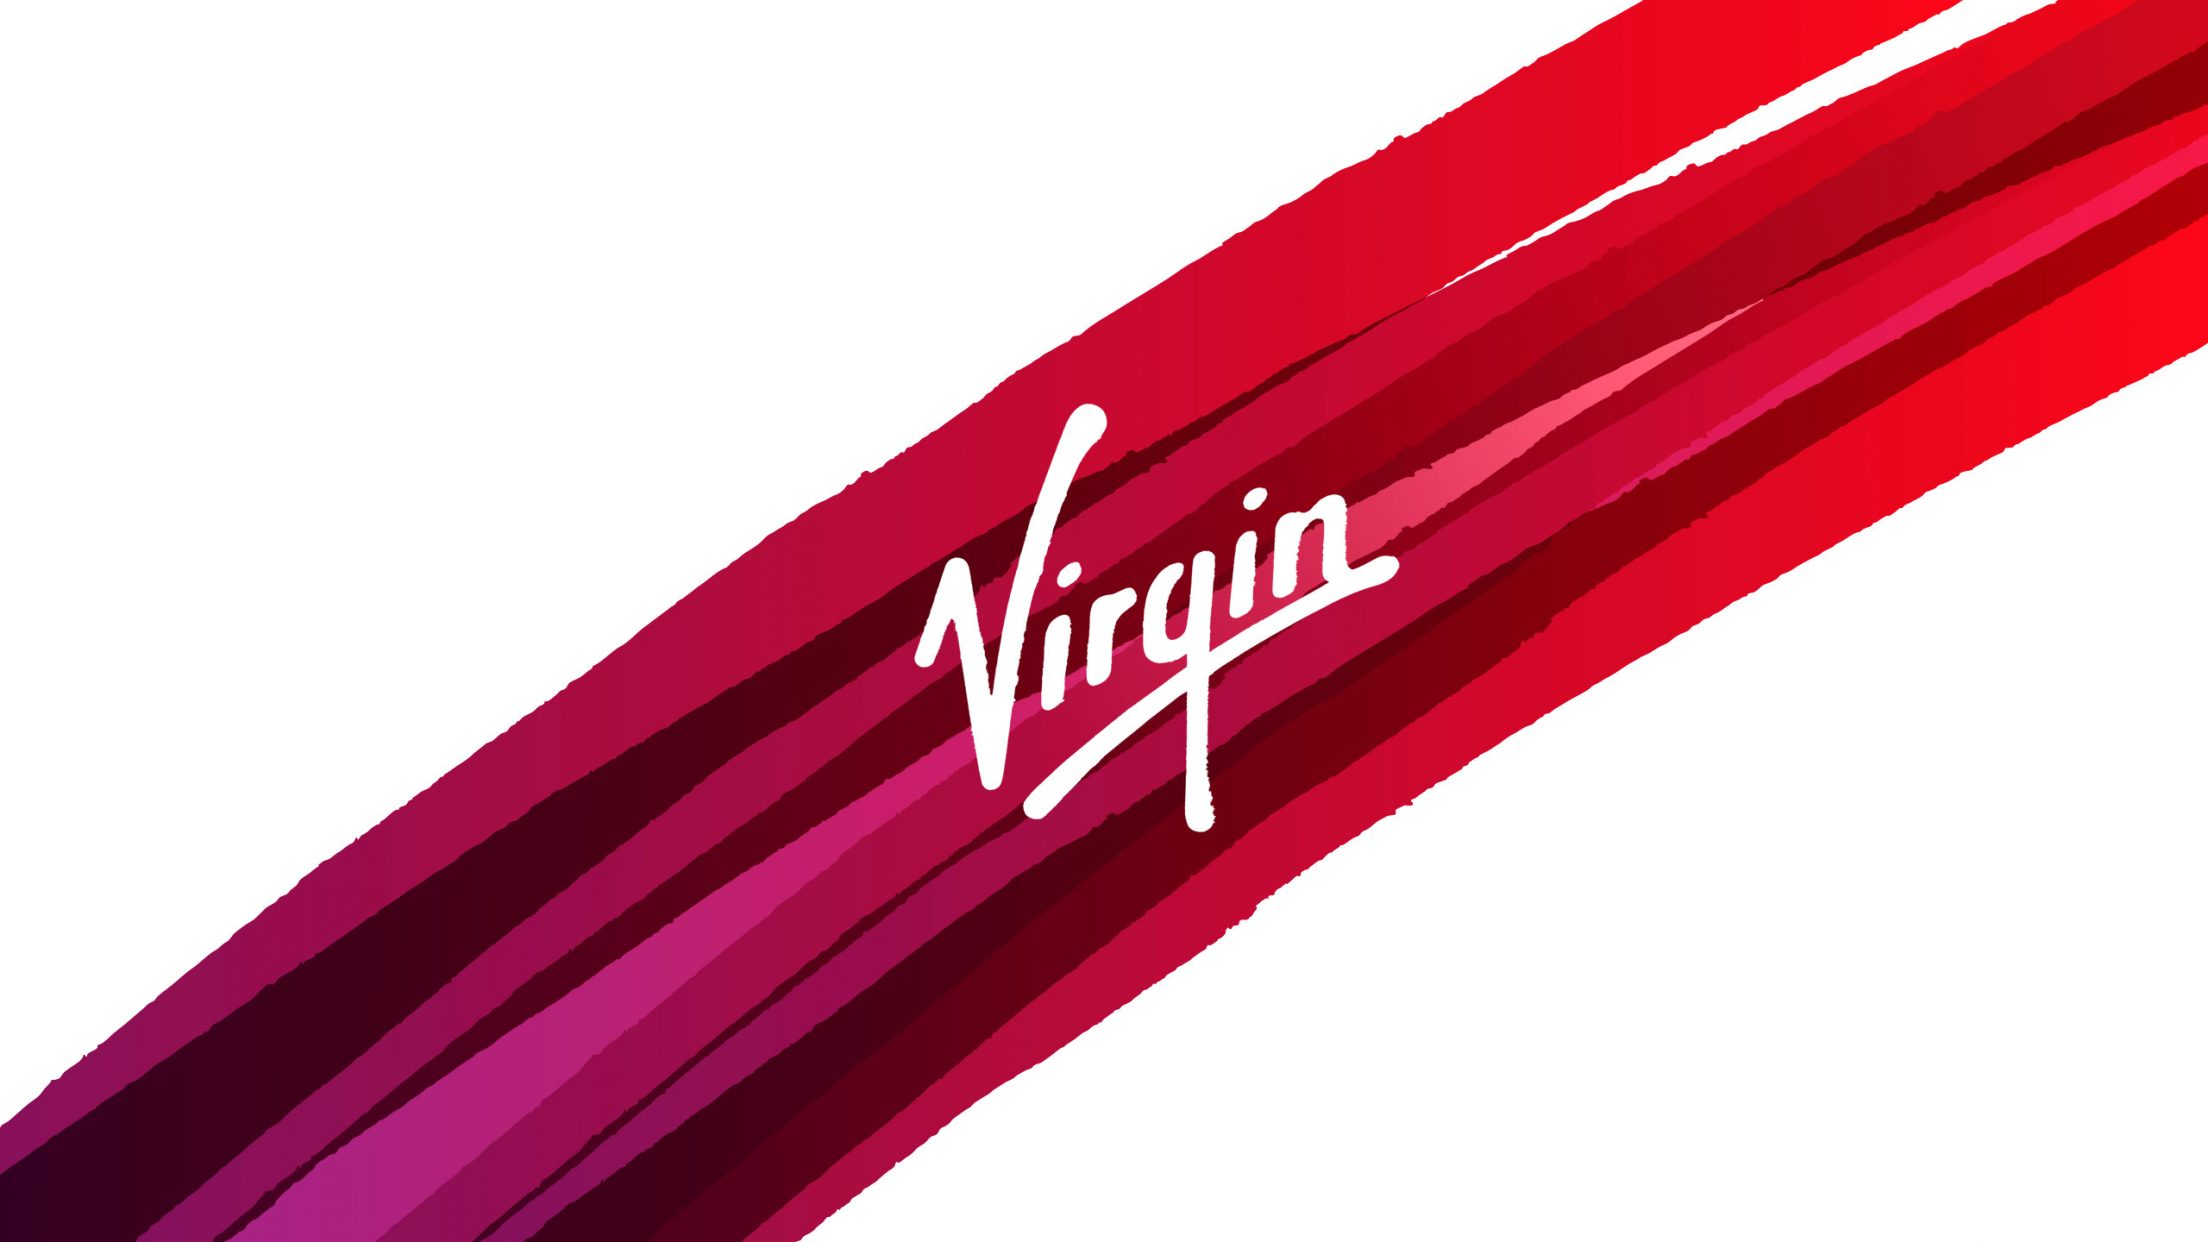 Cool Virgin Company Logo Wallpaper PaperPull 2208x1242